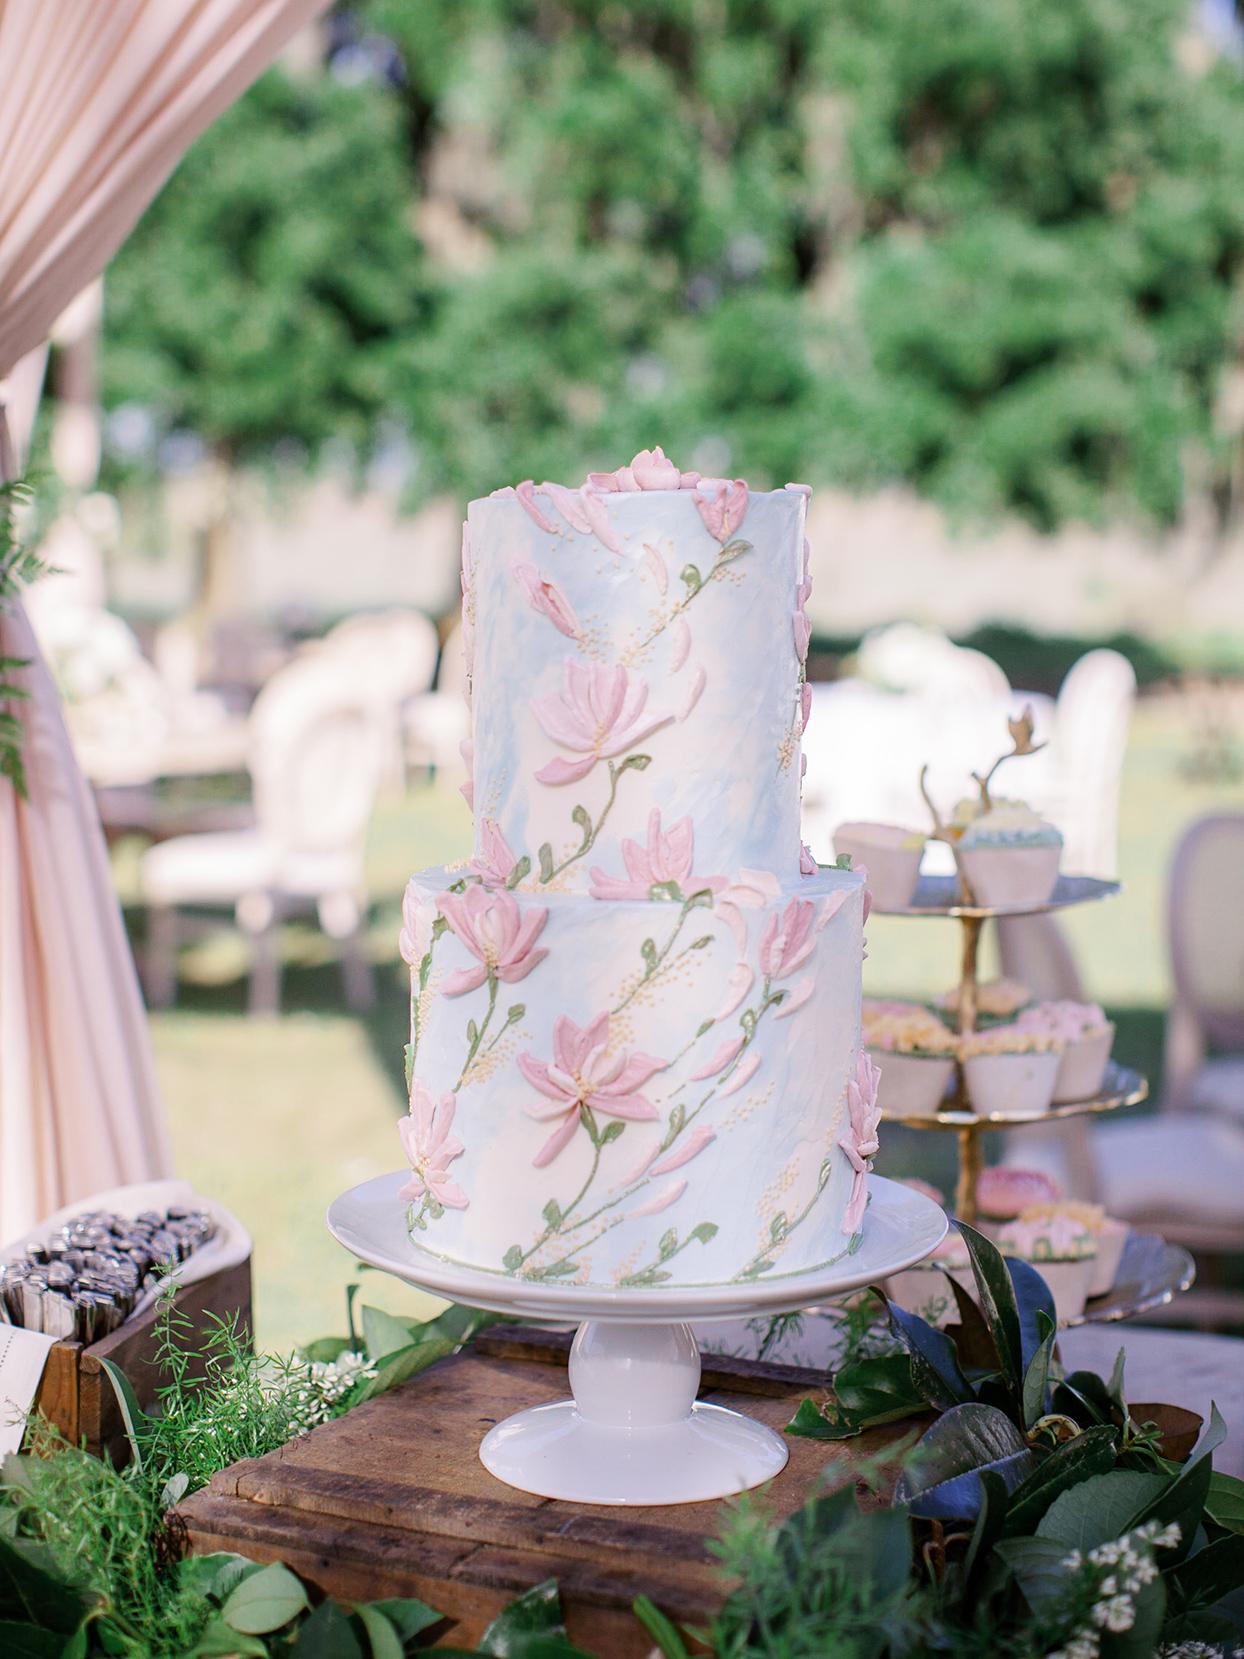 chelsea john floral pastel pink and blue wedding cake